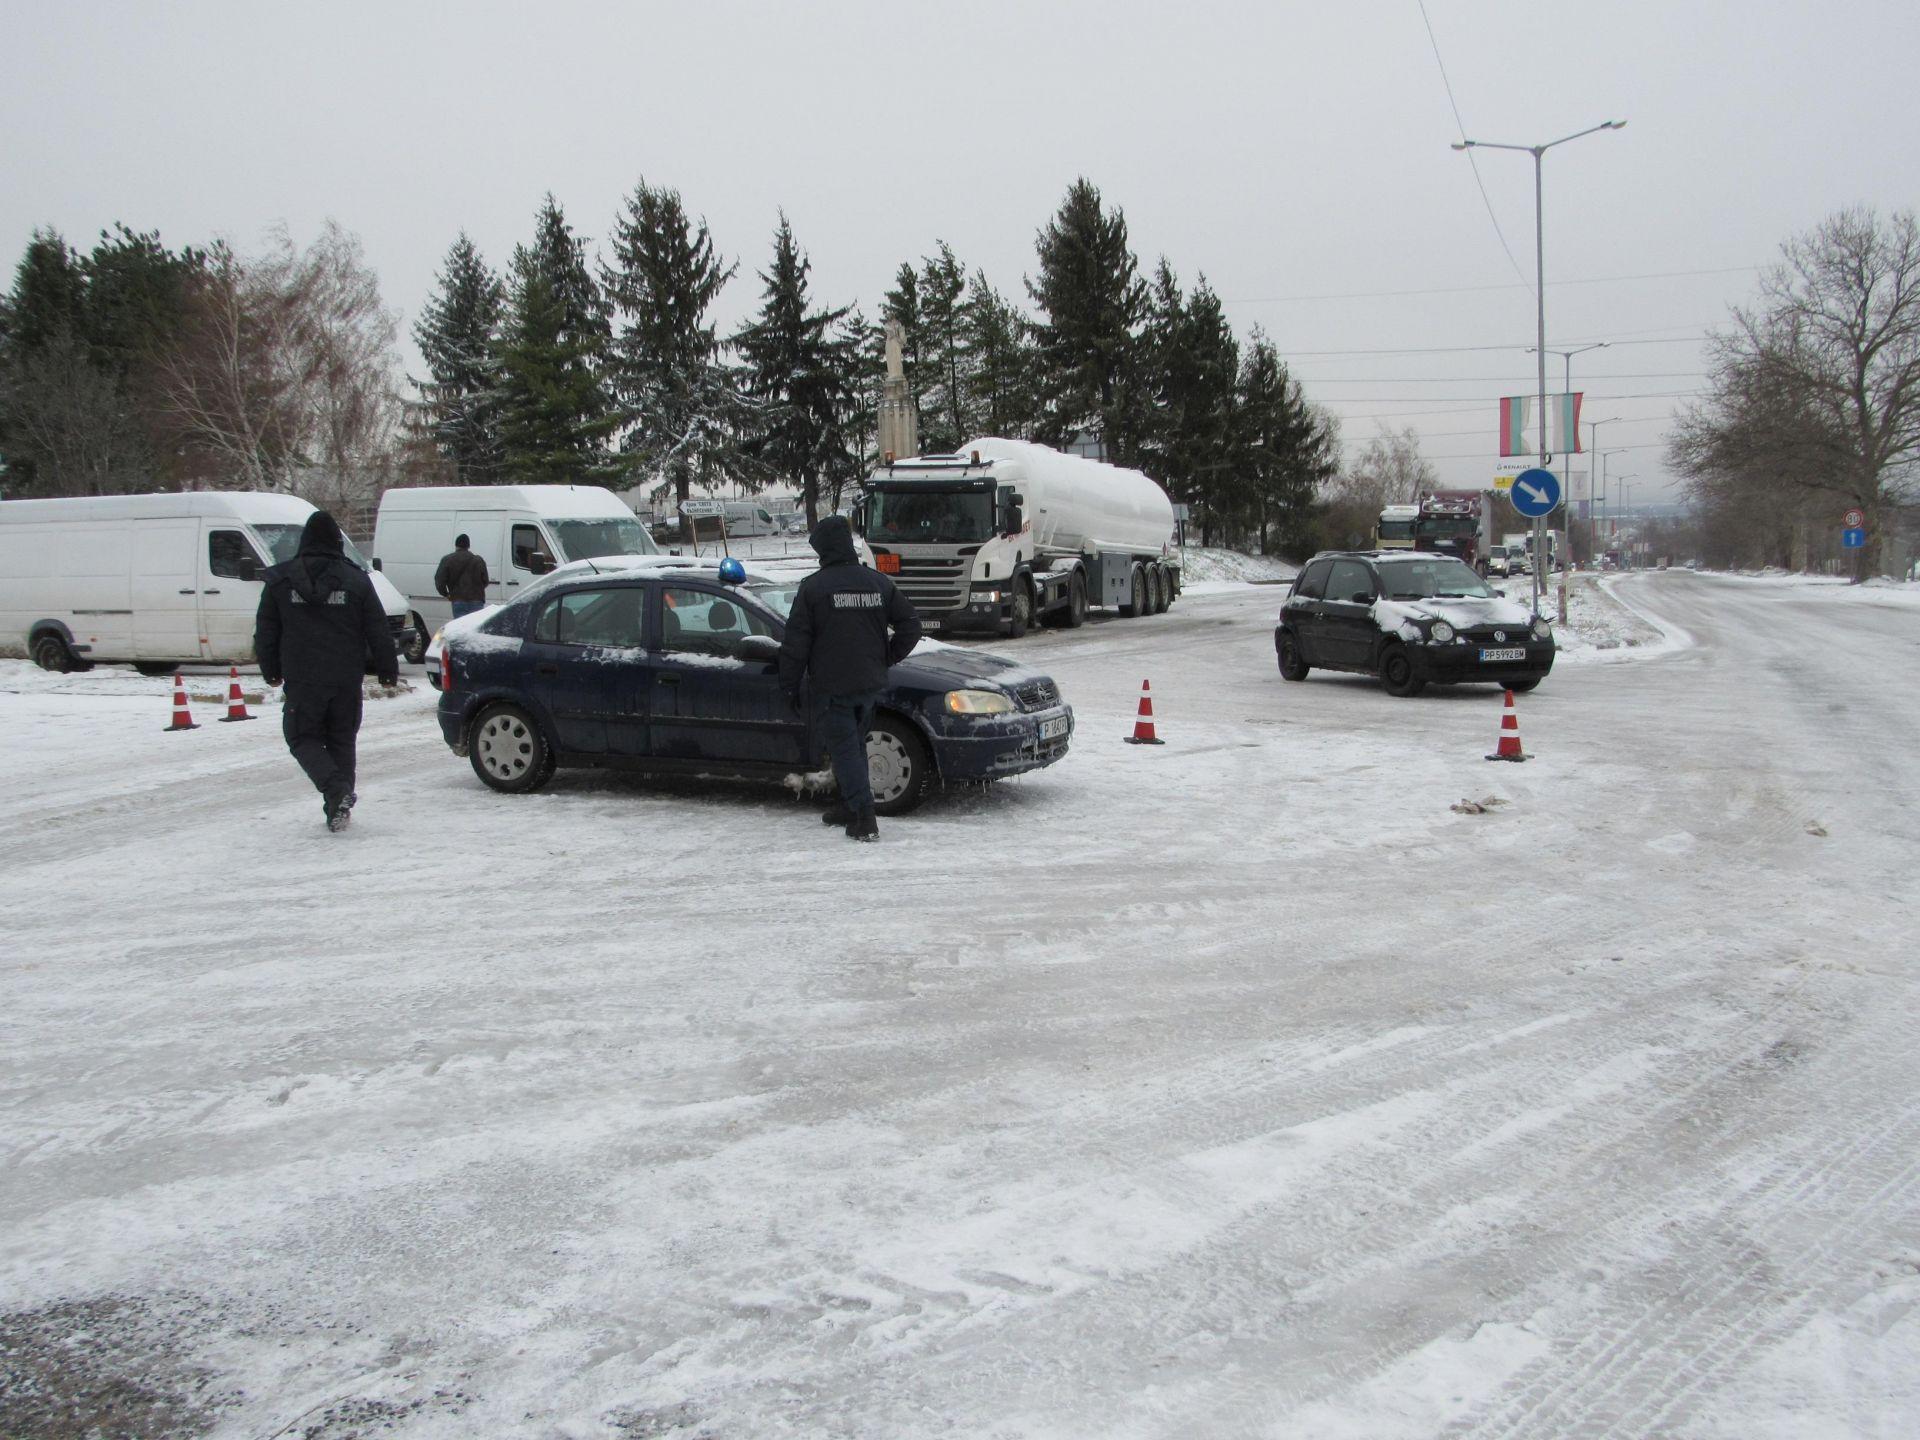 Закъсали камиони затвориха Русе-Бяла и Русе-Разград